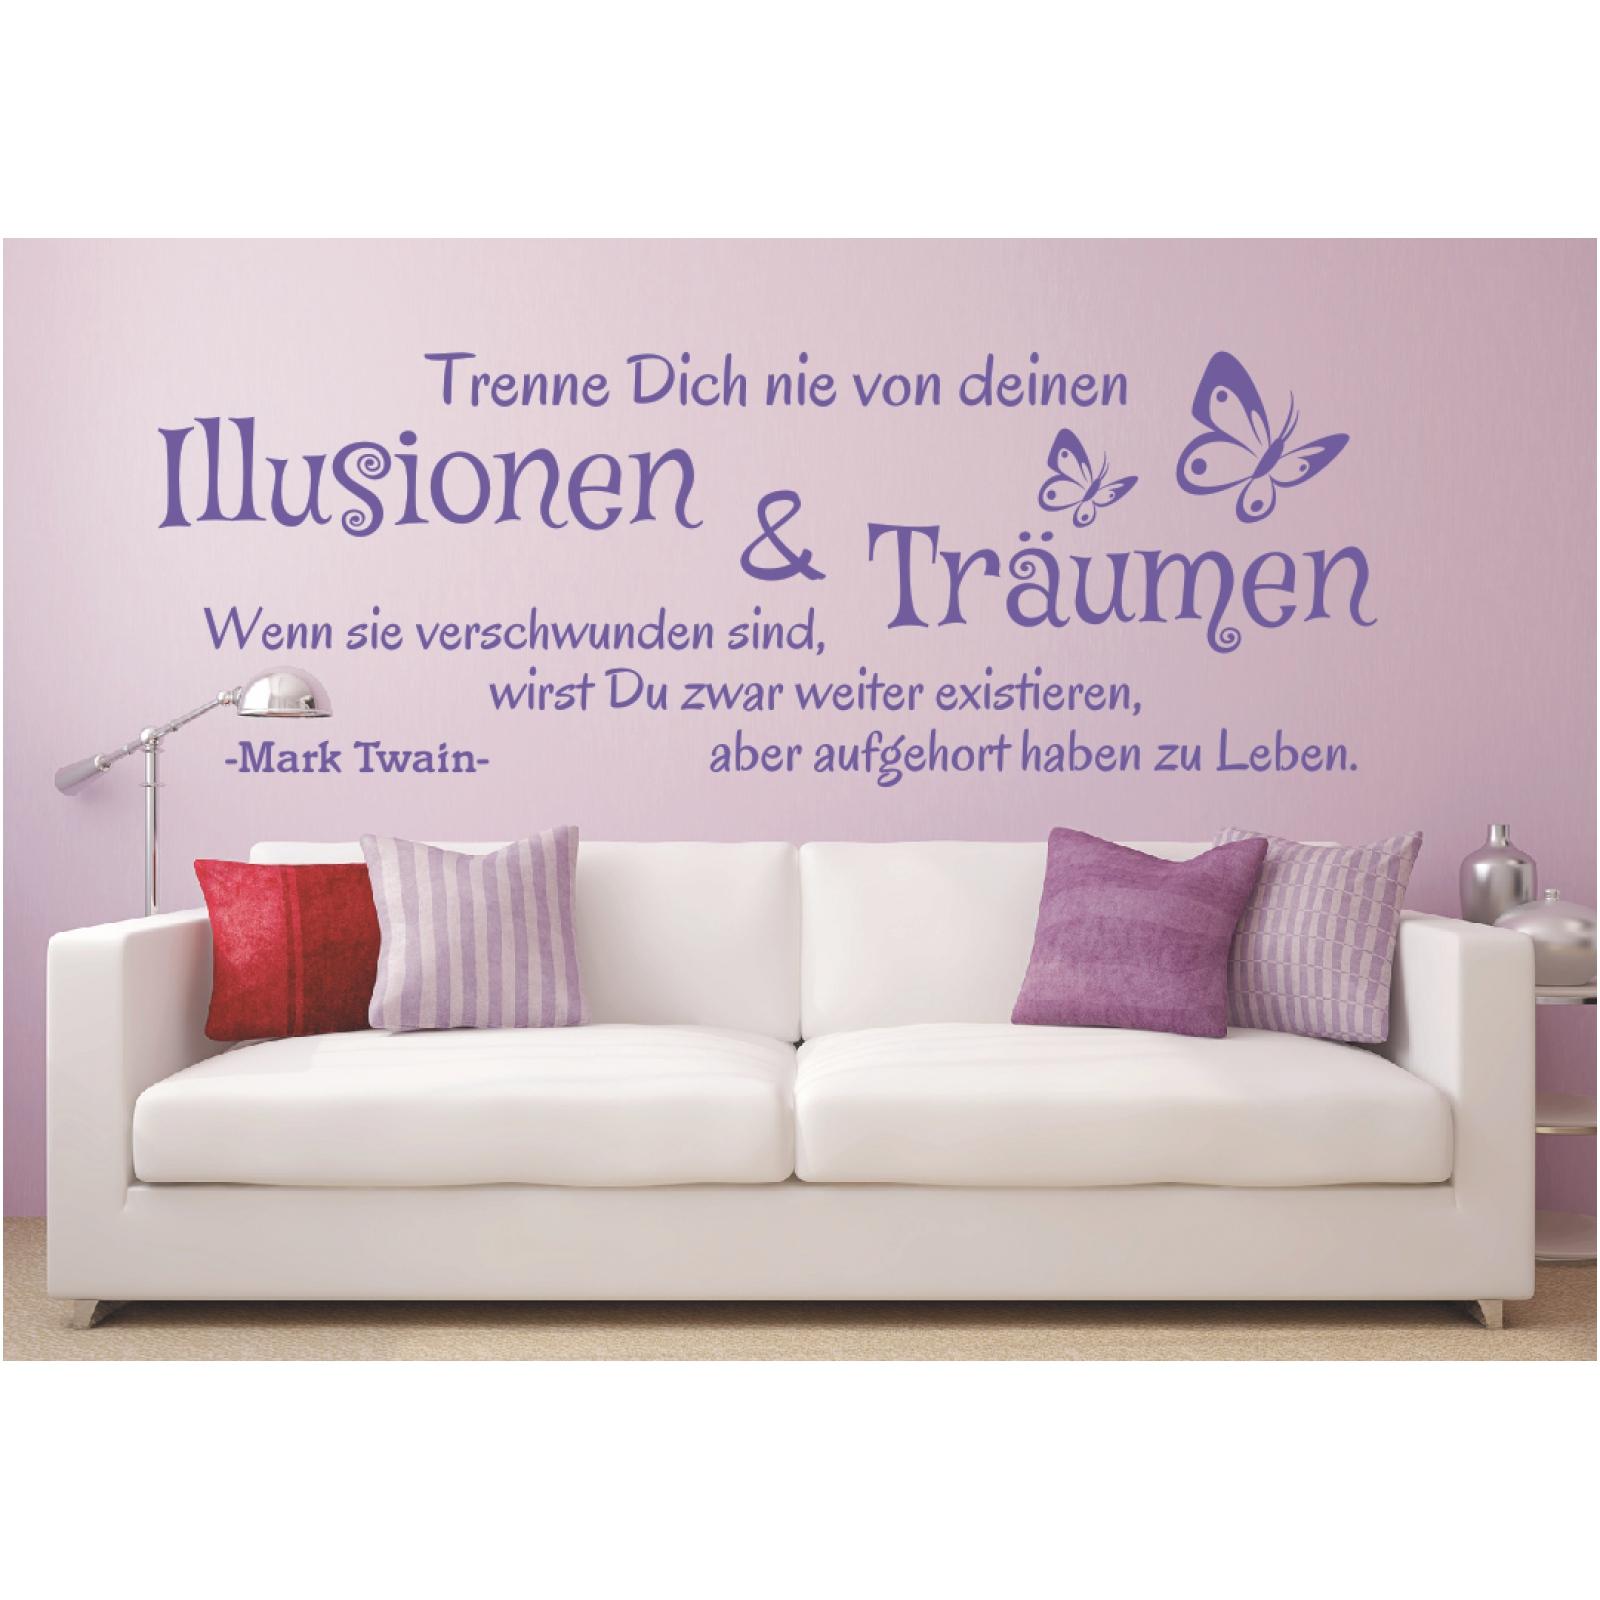 "Wandsticker Wanddeko Wandaufkleber Wandtattoo Zitat /""Trenne dich.../"" Träume"